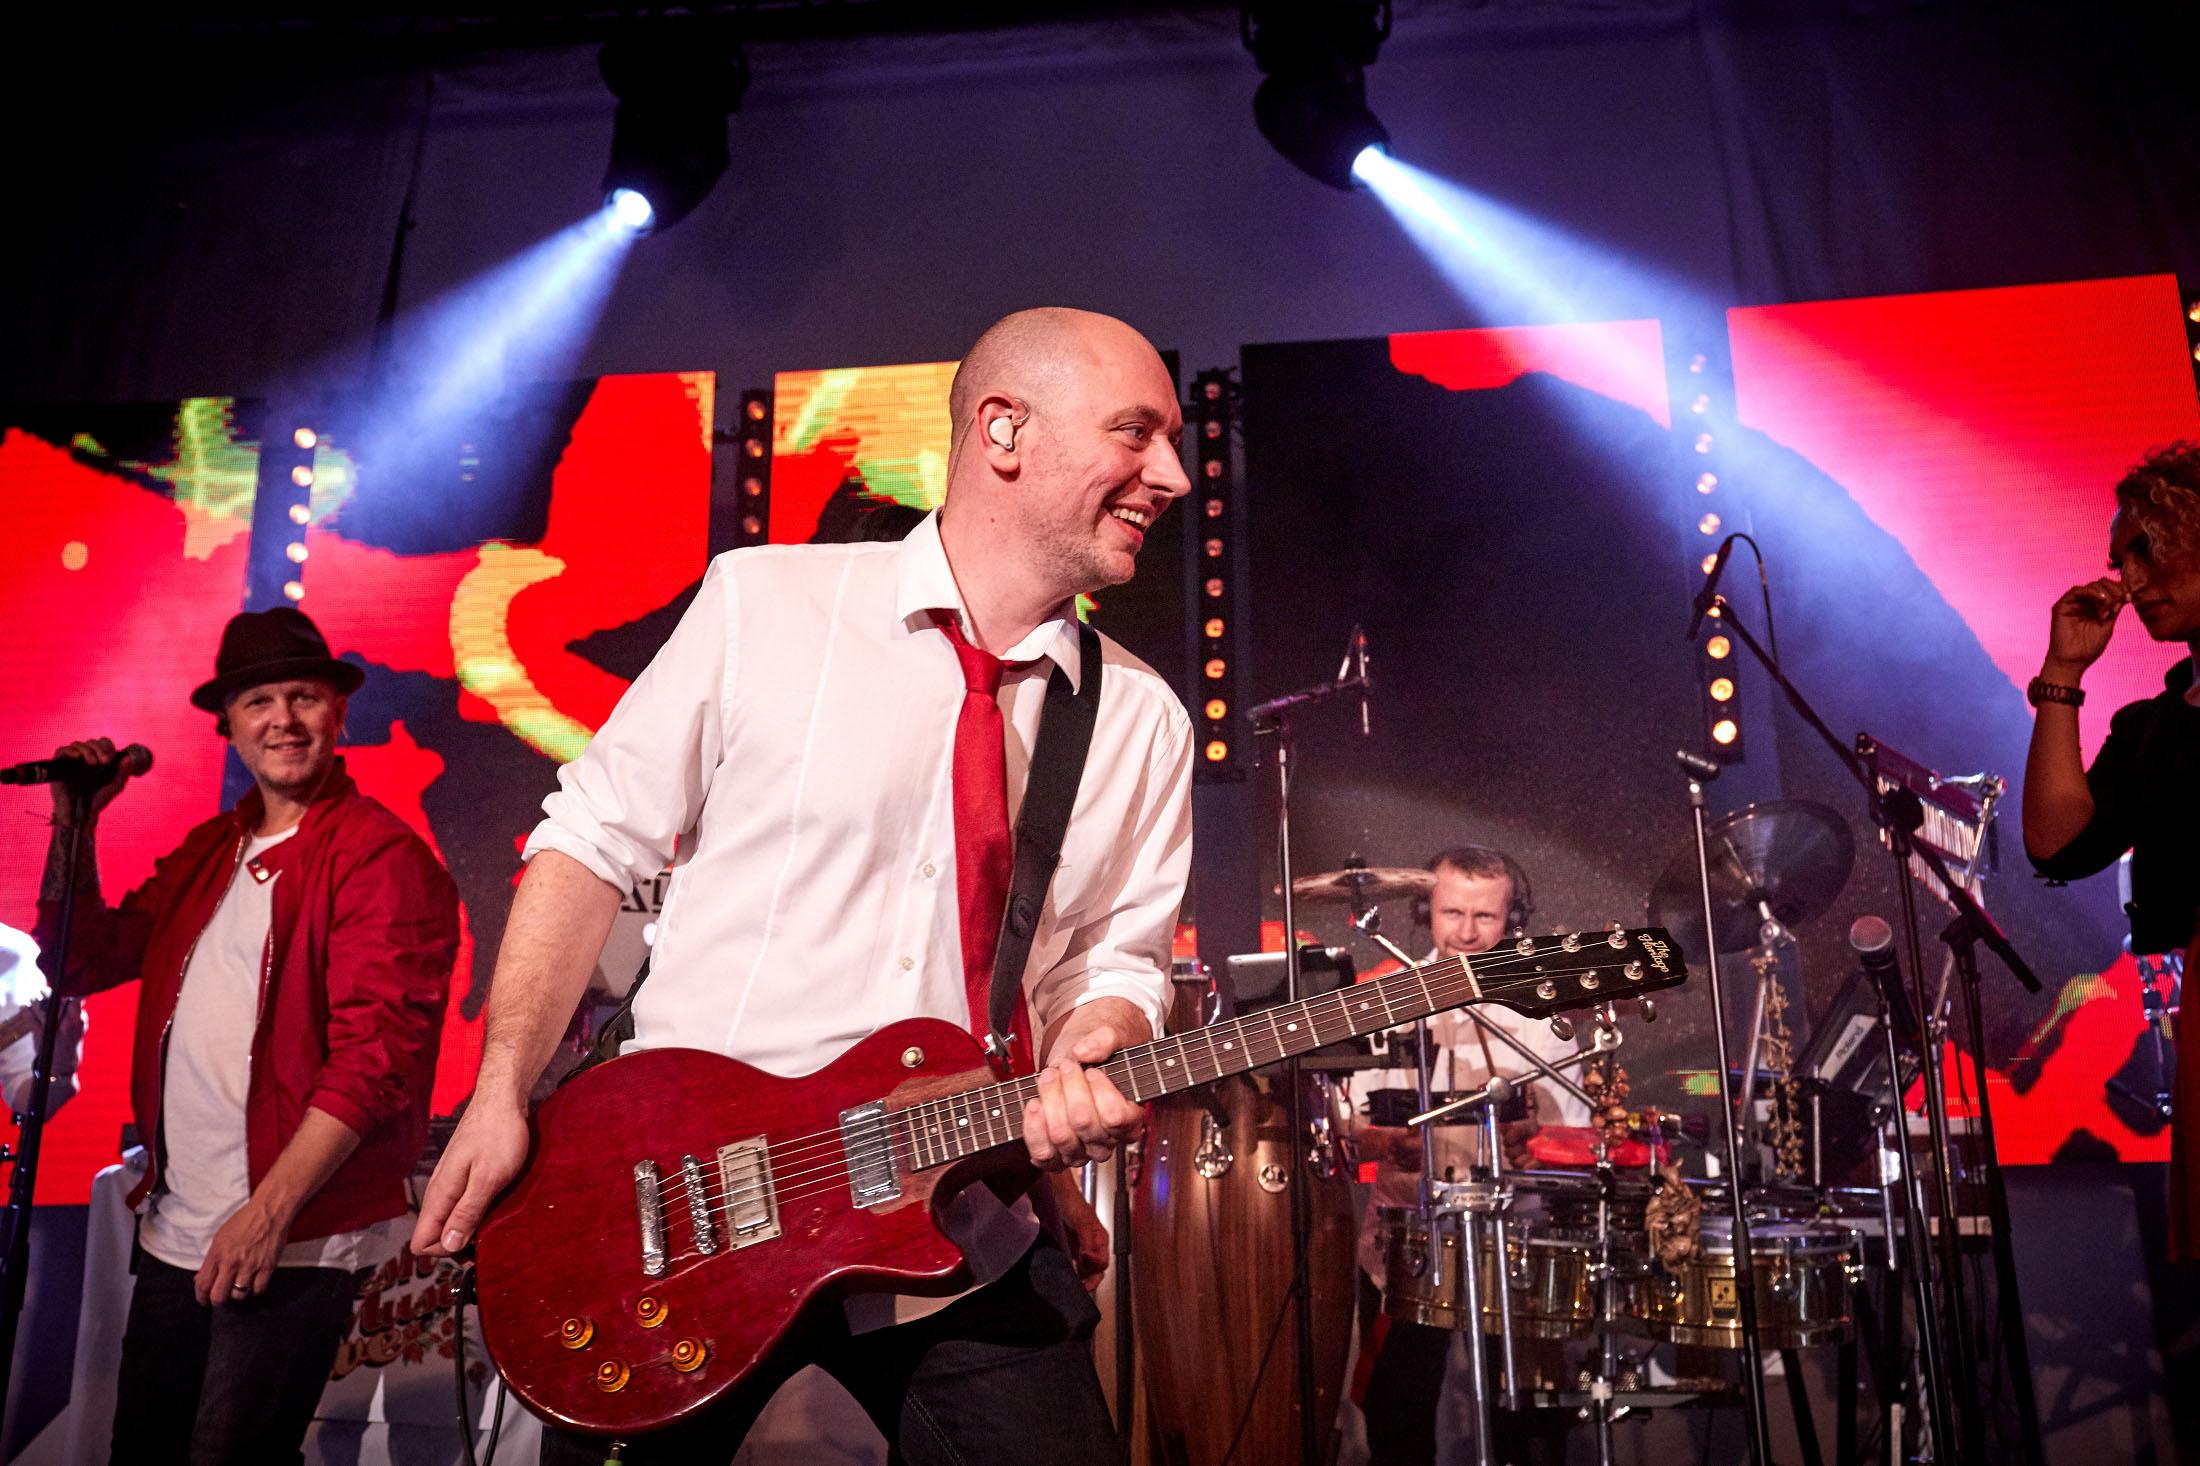 FRESH-MUSIC-LIVE_GUITAR_FLORIAN_WALTHER_04